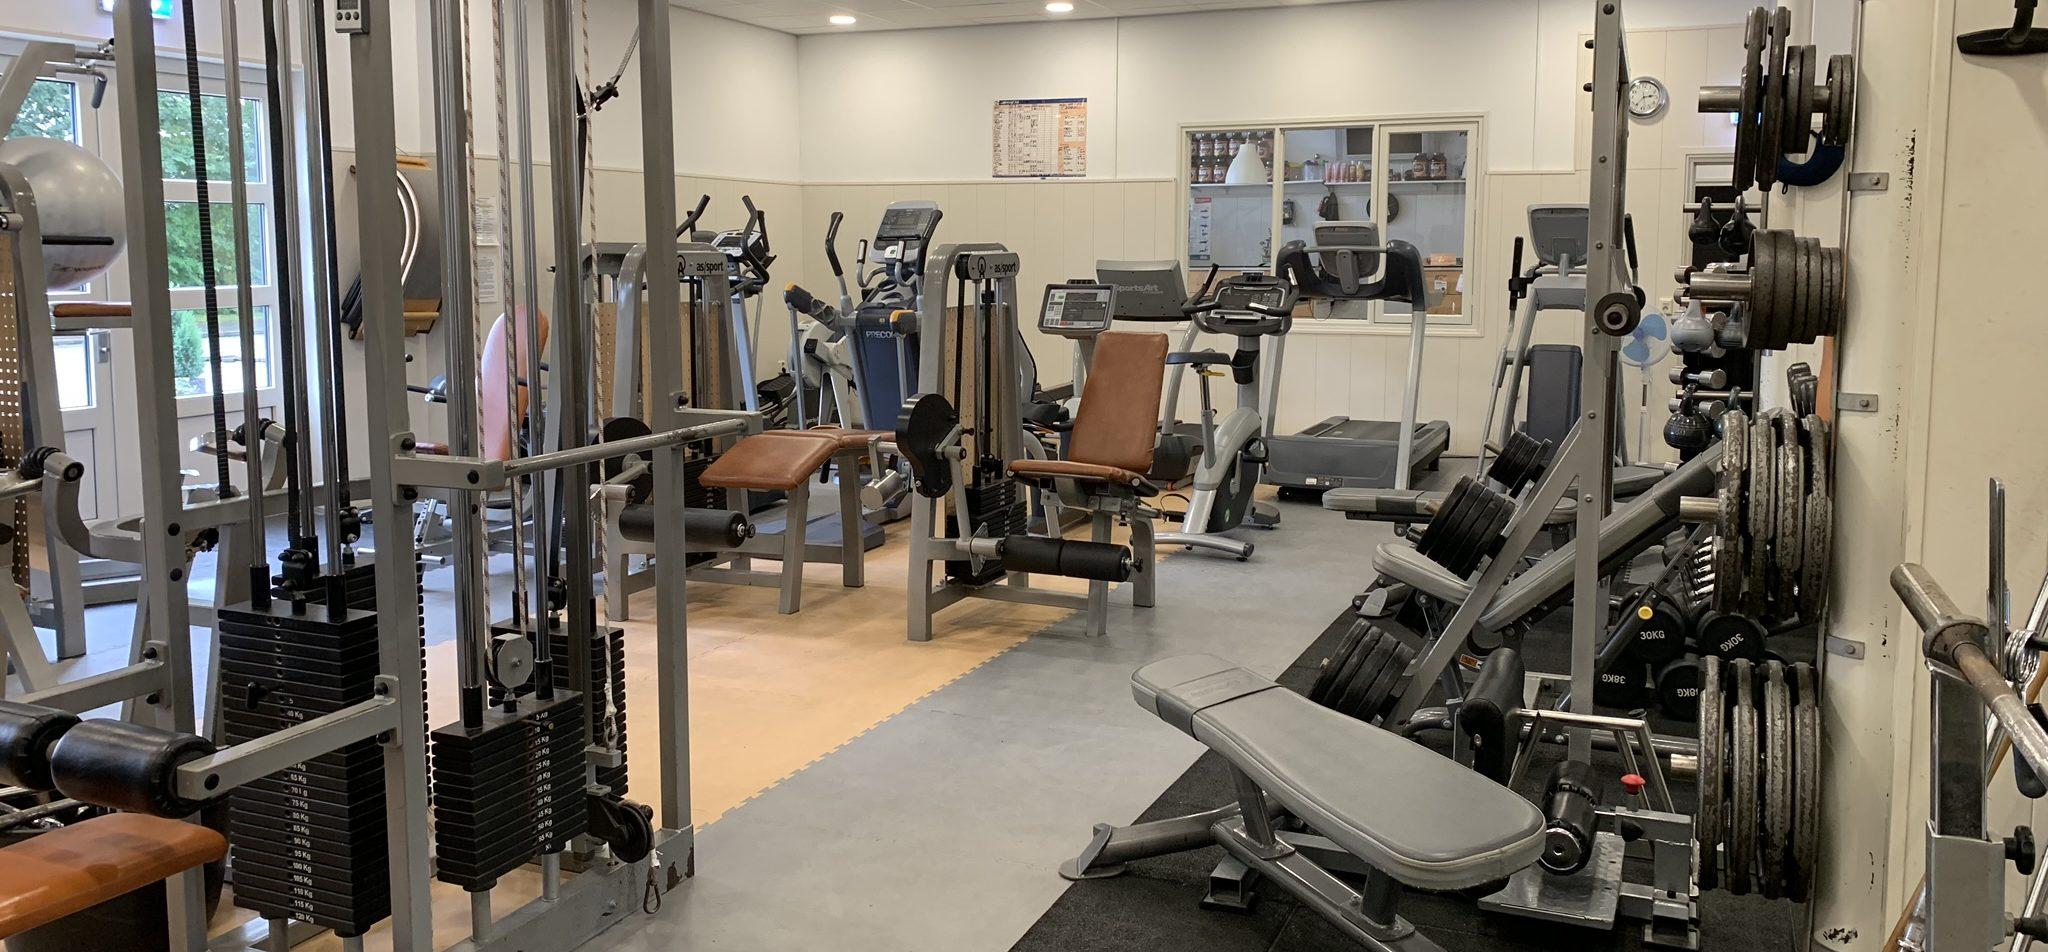 Sportschool Universal Gym - Fitness